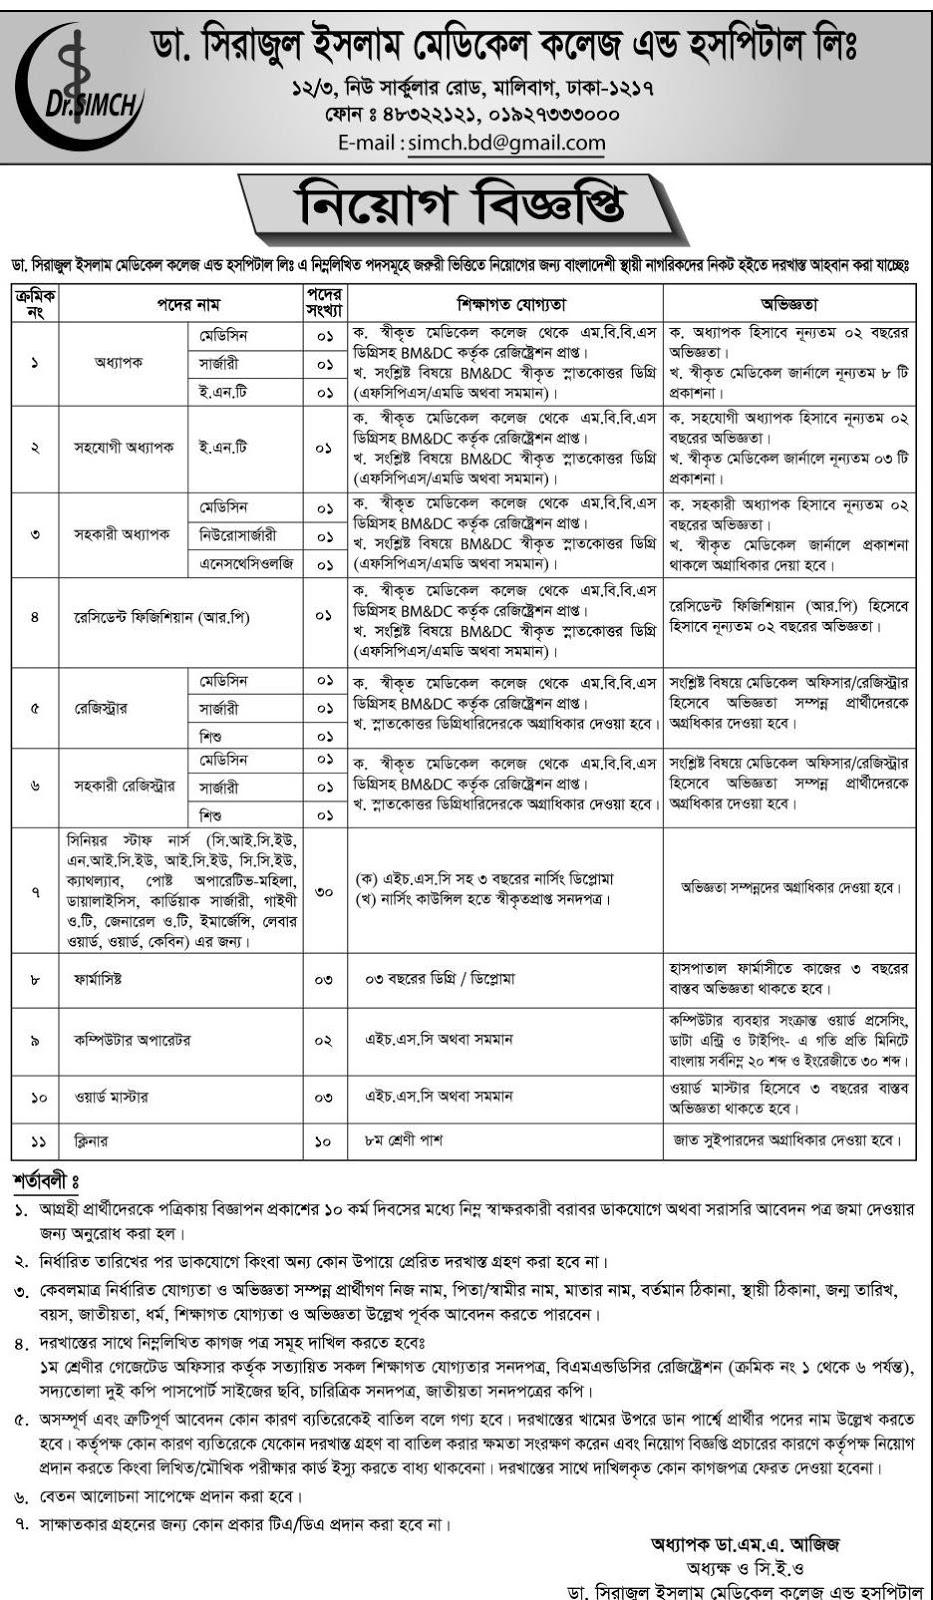 Dr. Sirajul Islam Medical College and Hospital Limited Job Circular 2018